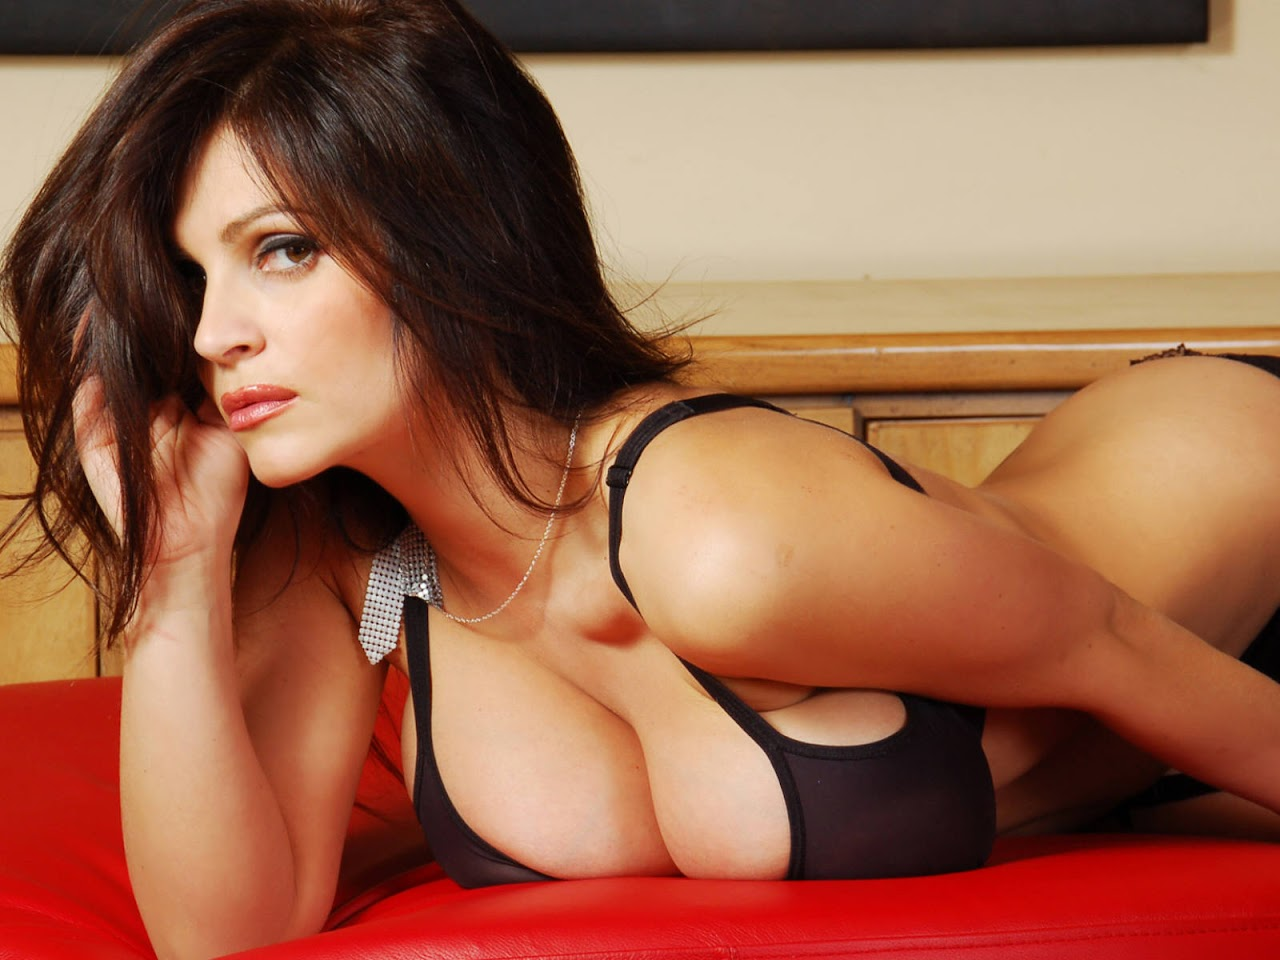 http://1.bp.blogspot.com/_Si7zjQmZnm4/SzbtPlhi0rI/AAAAAAAAGwE/NYYIAuVOTlY/s1600/Fullwalls.blogspot.com_Denise_Milani%2869%29.jpg